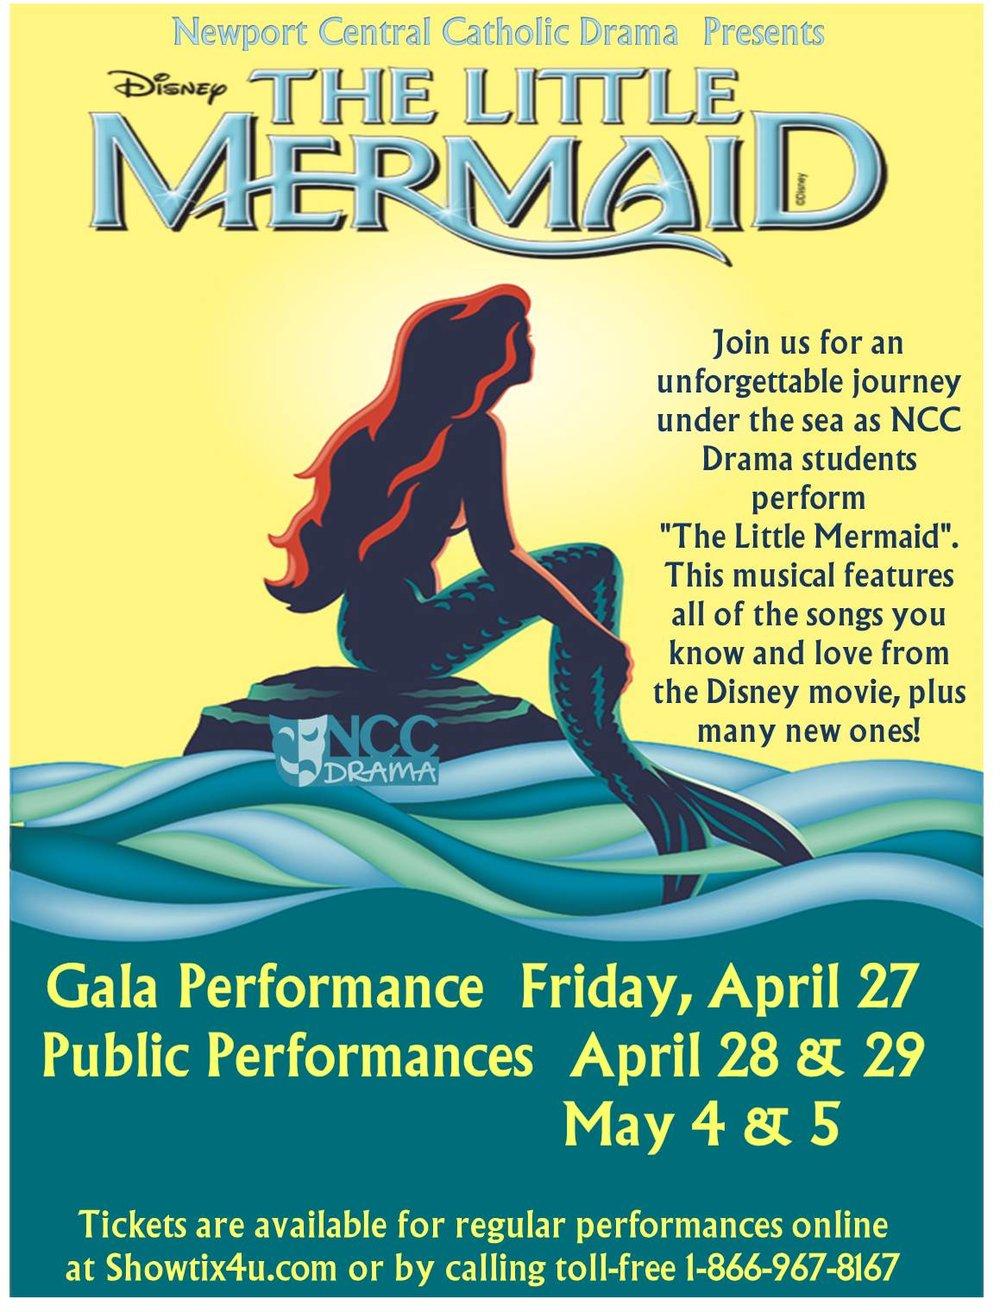 poster+advertising+the+litte+mermaid.jpg